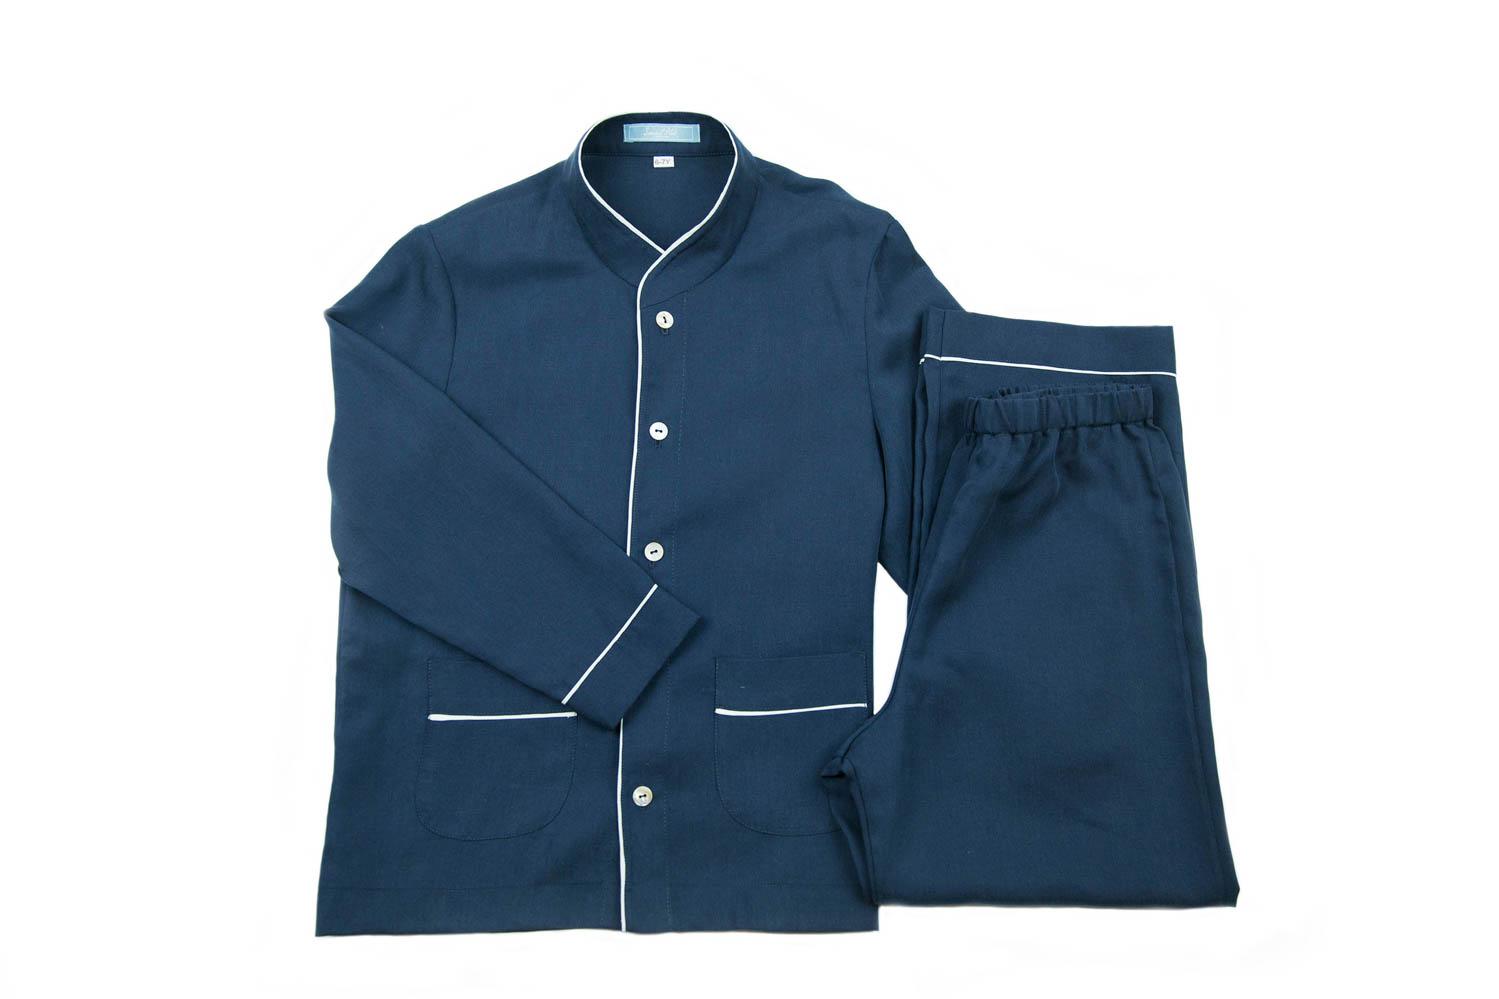 smart_alek-product-pijamas-blue-01.jpg